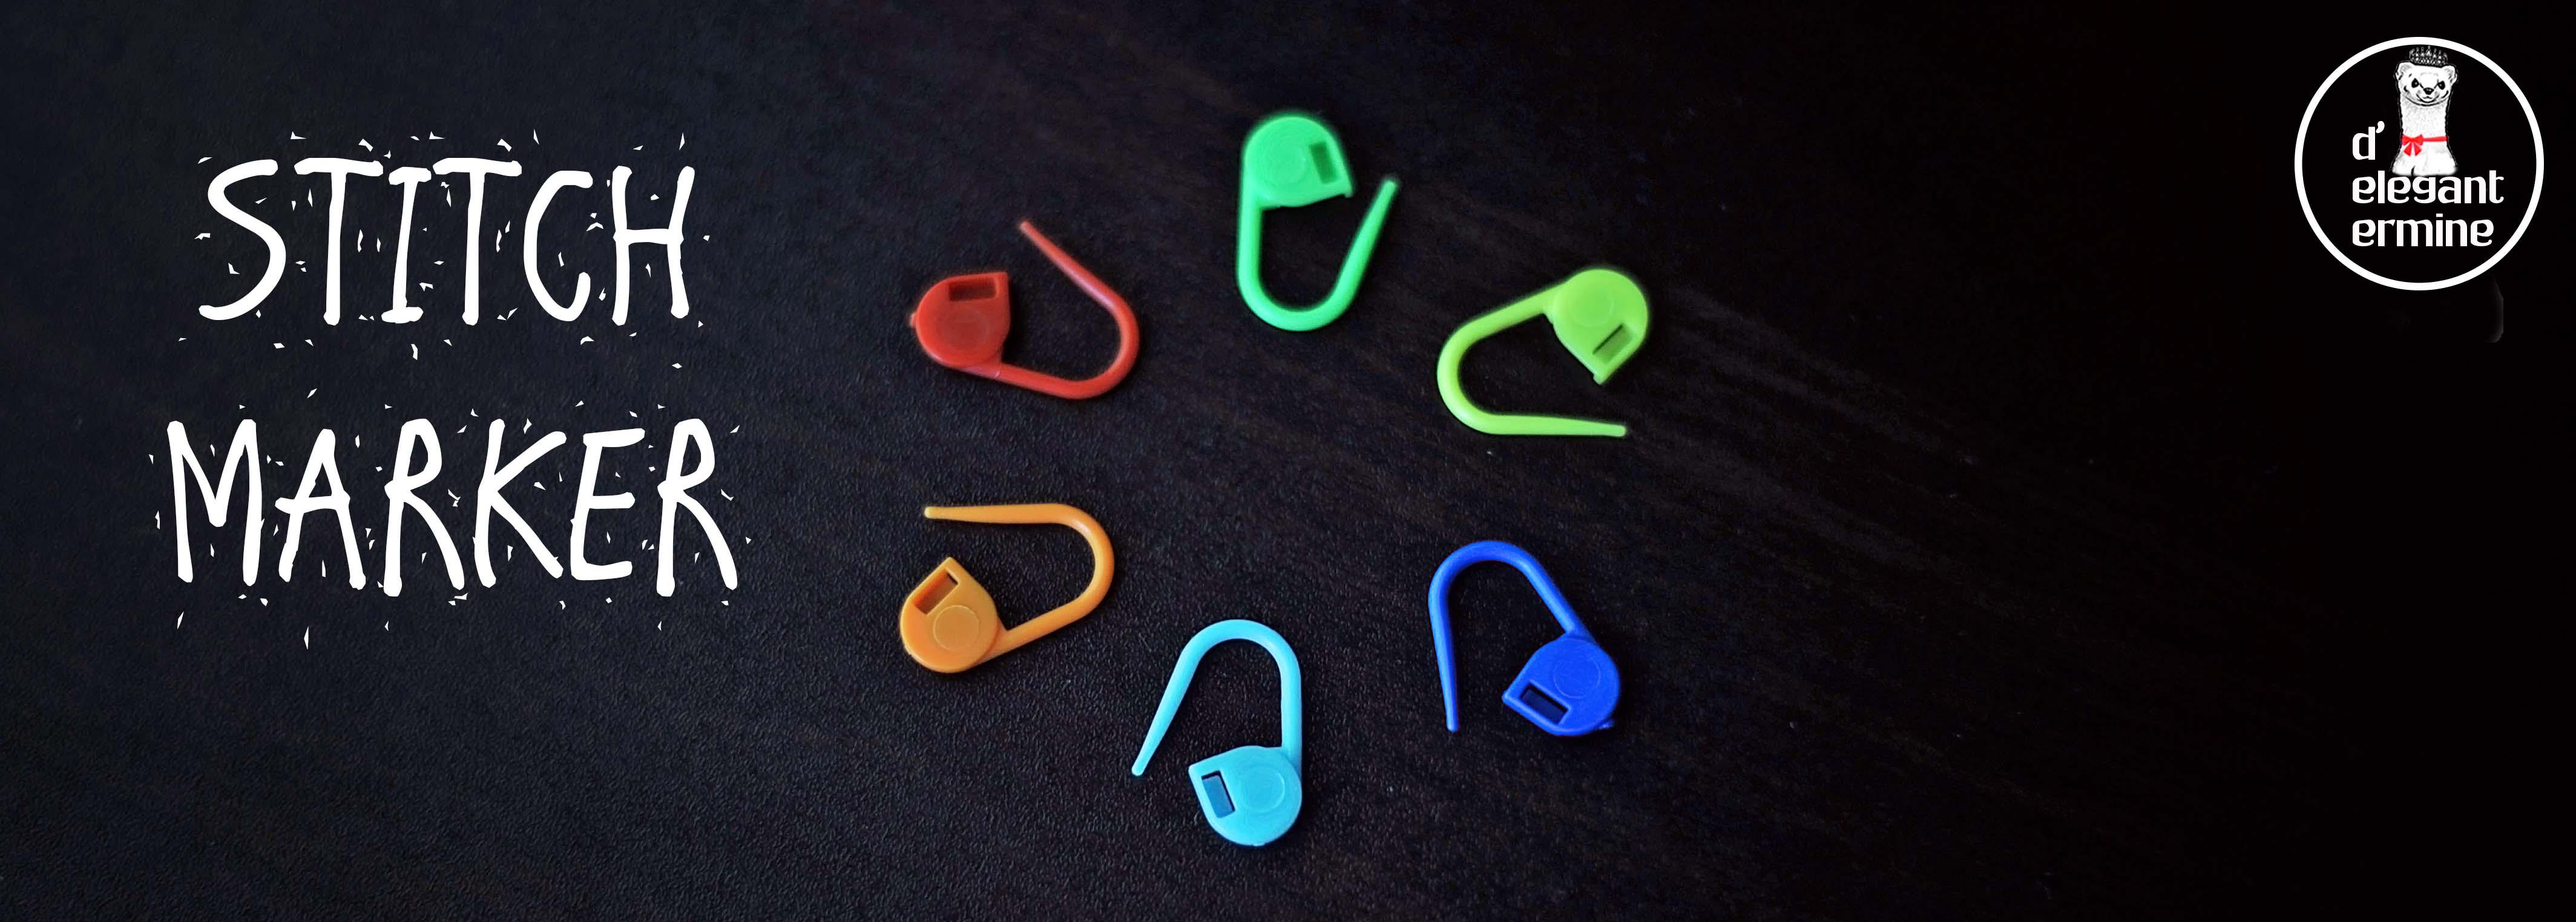 stitchmarker2.jpg